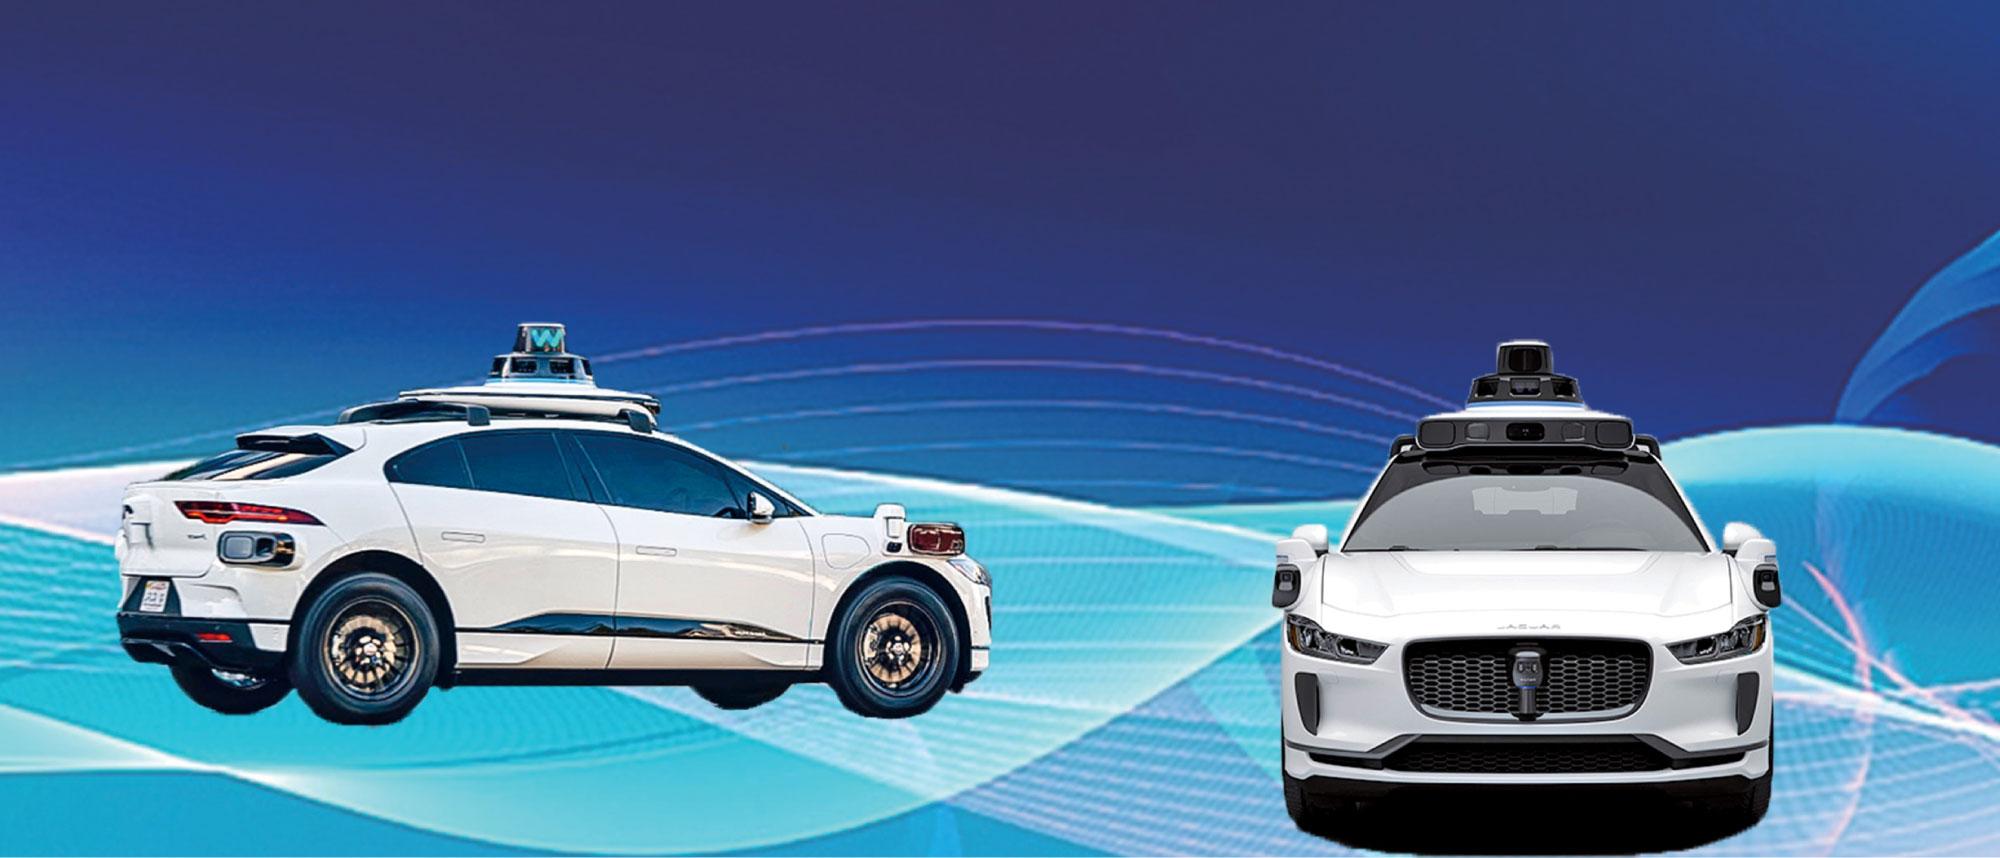 Waymo新一代系統,將首先用在即將推出的Jaguar I-Pace電動SUV上。圖為行駛在三藩市的自動駕駛版I-Pace。(Waymo)